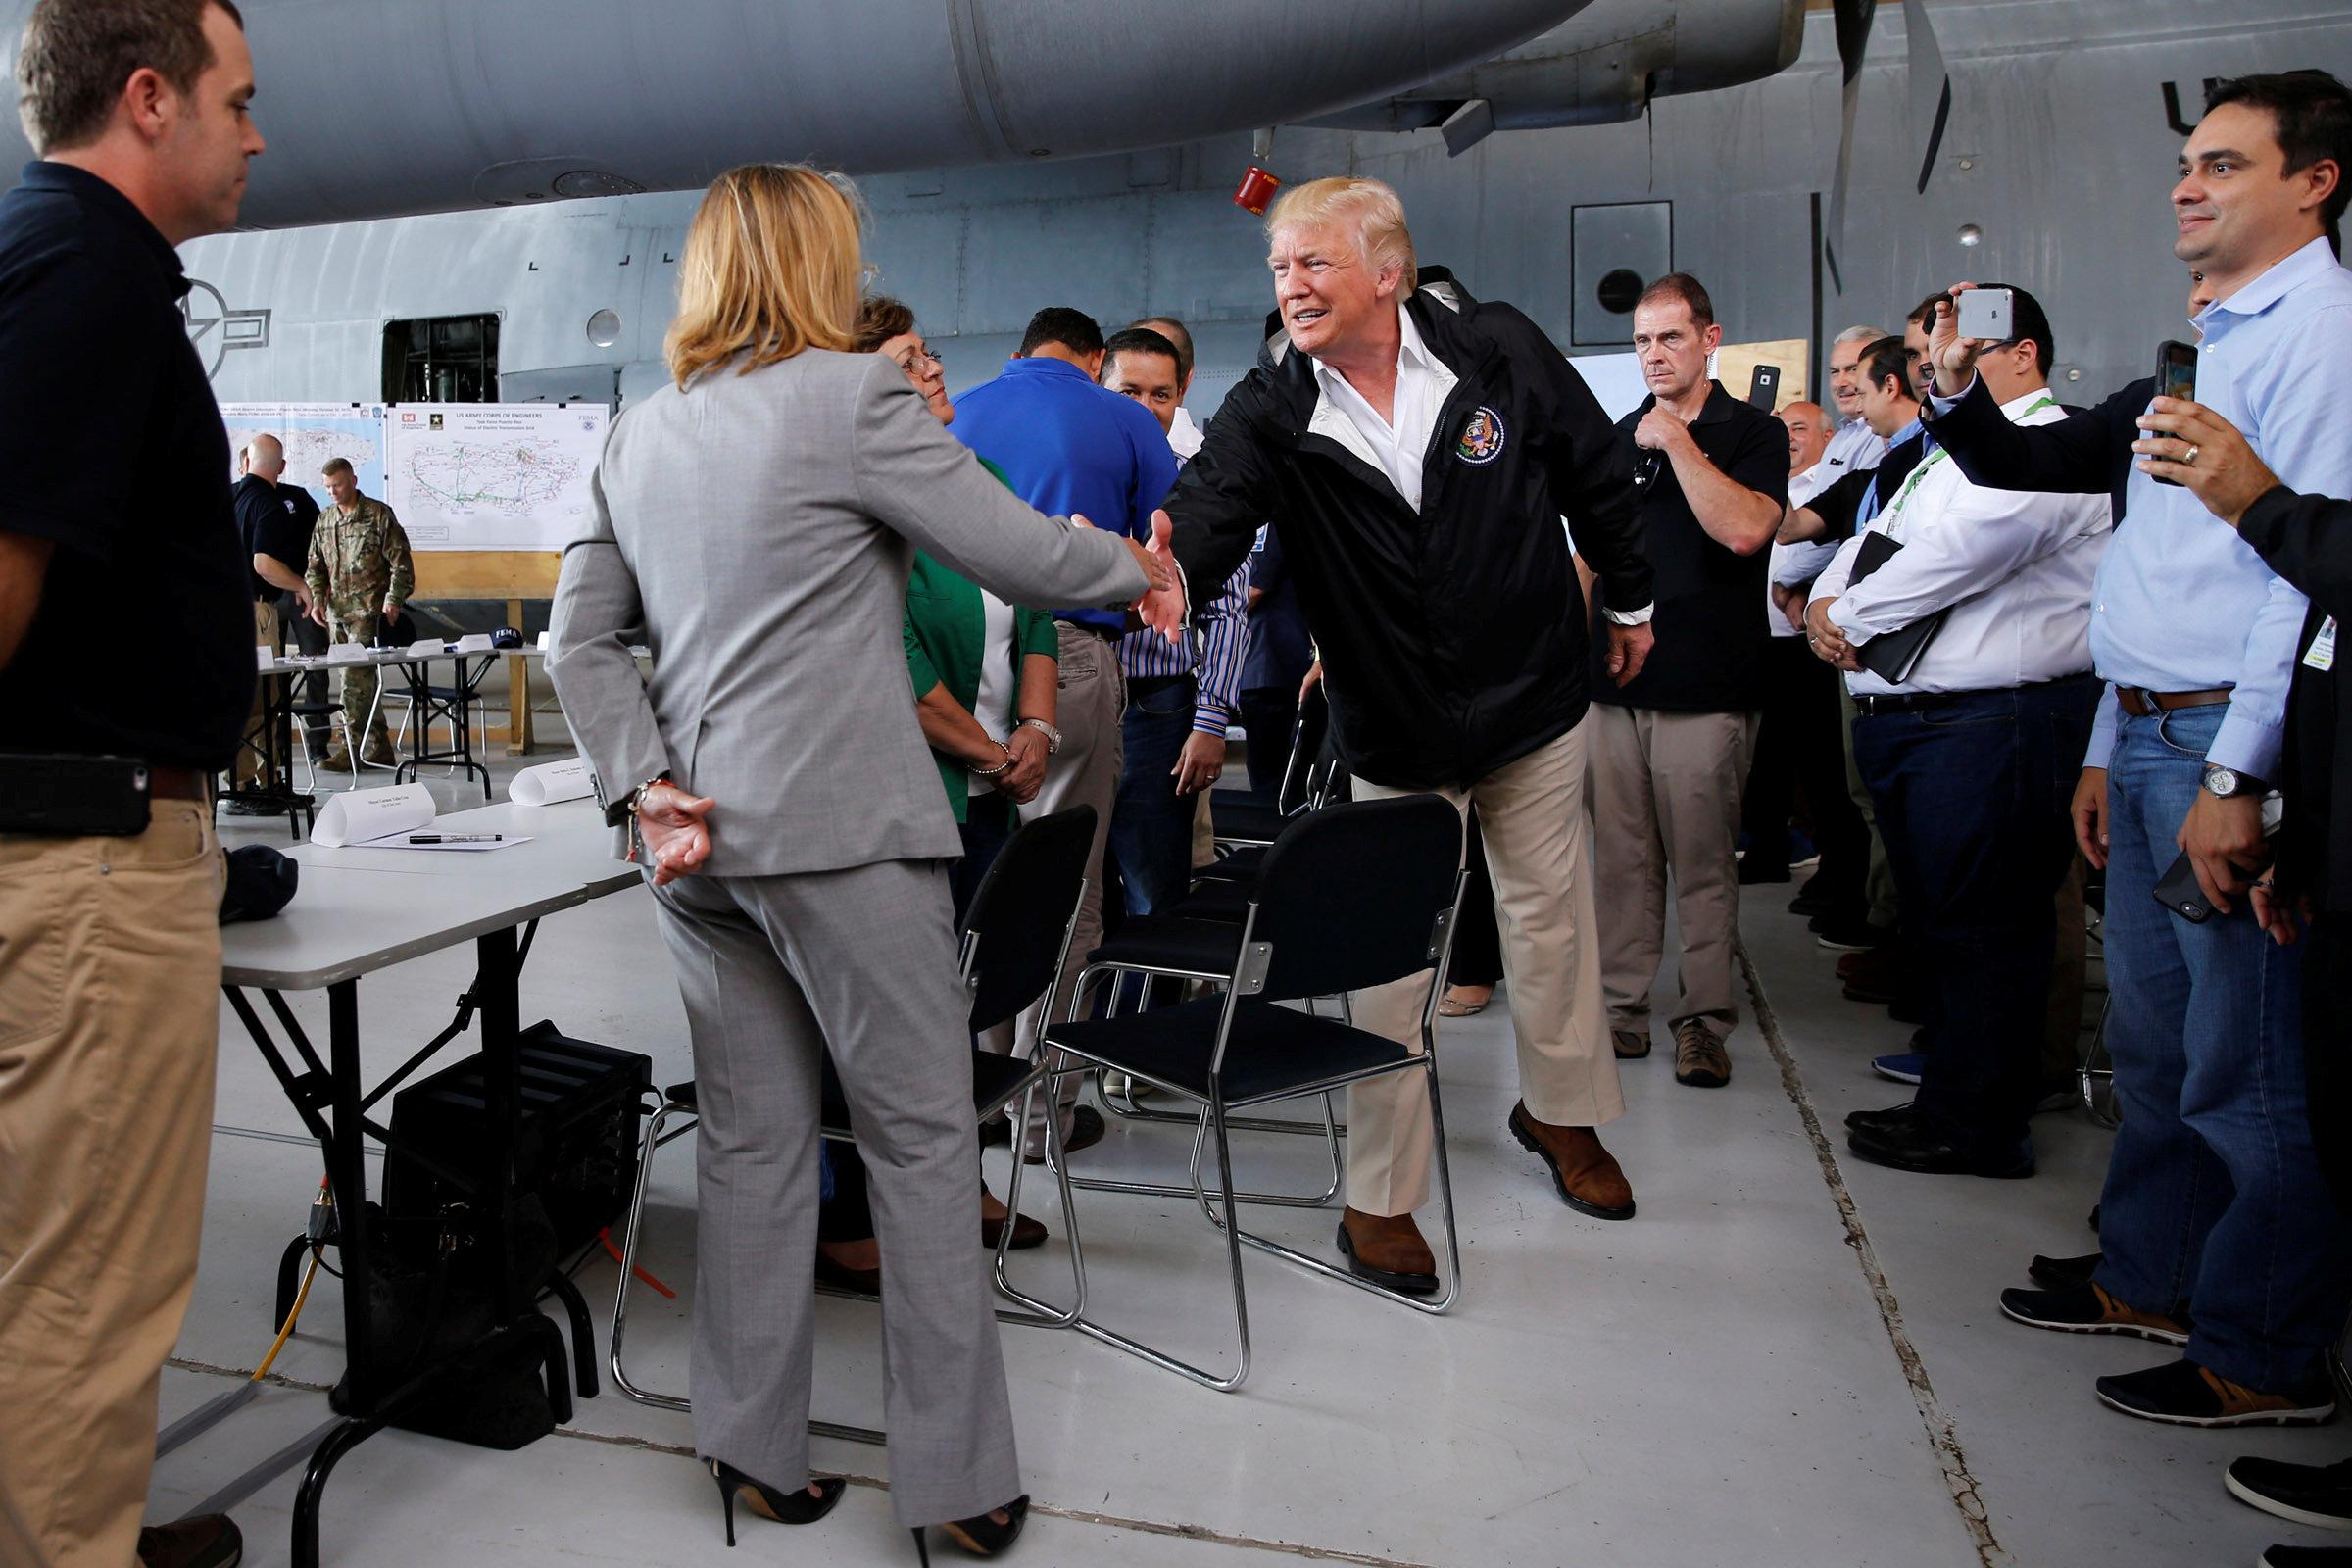 U.S. President Donald Trump shakes hands with San Juan Mayor Carmen Yulin Cruz before a briefing to survey hurricane damage, at Muniz Air National Guard Base in Carolina, Puerto Rico, U.S. October 3, 2017. REUTERS/Jonathan Ernst